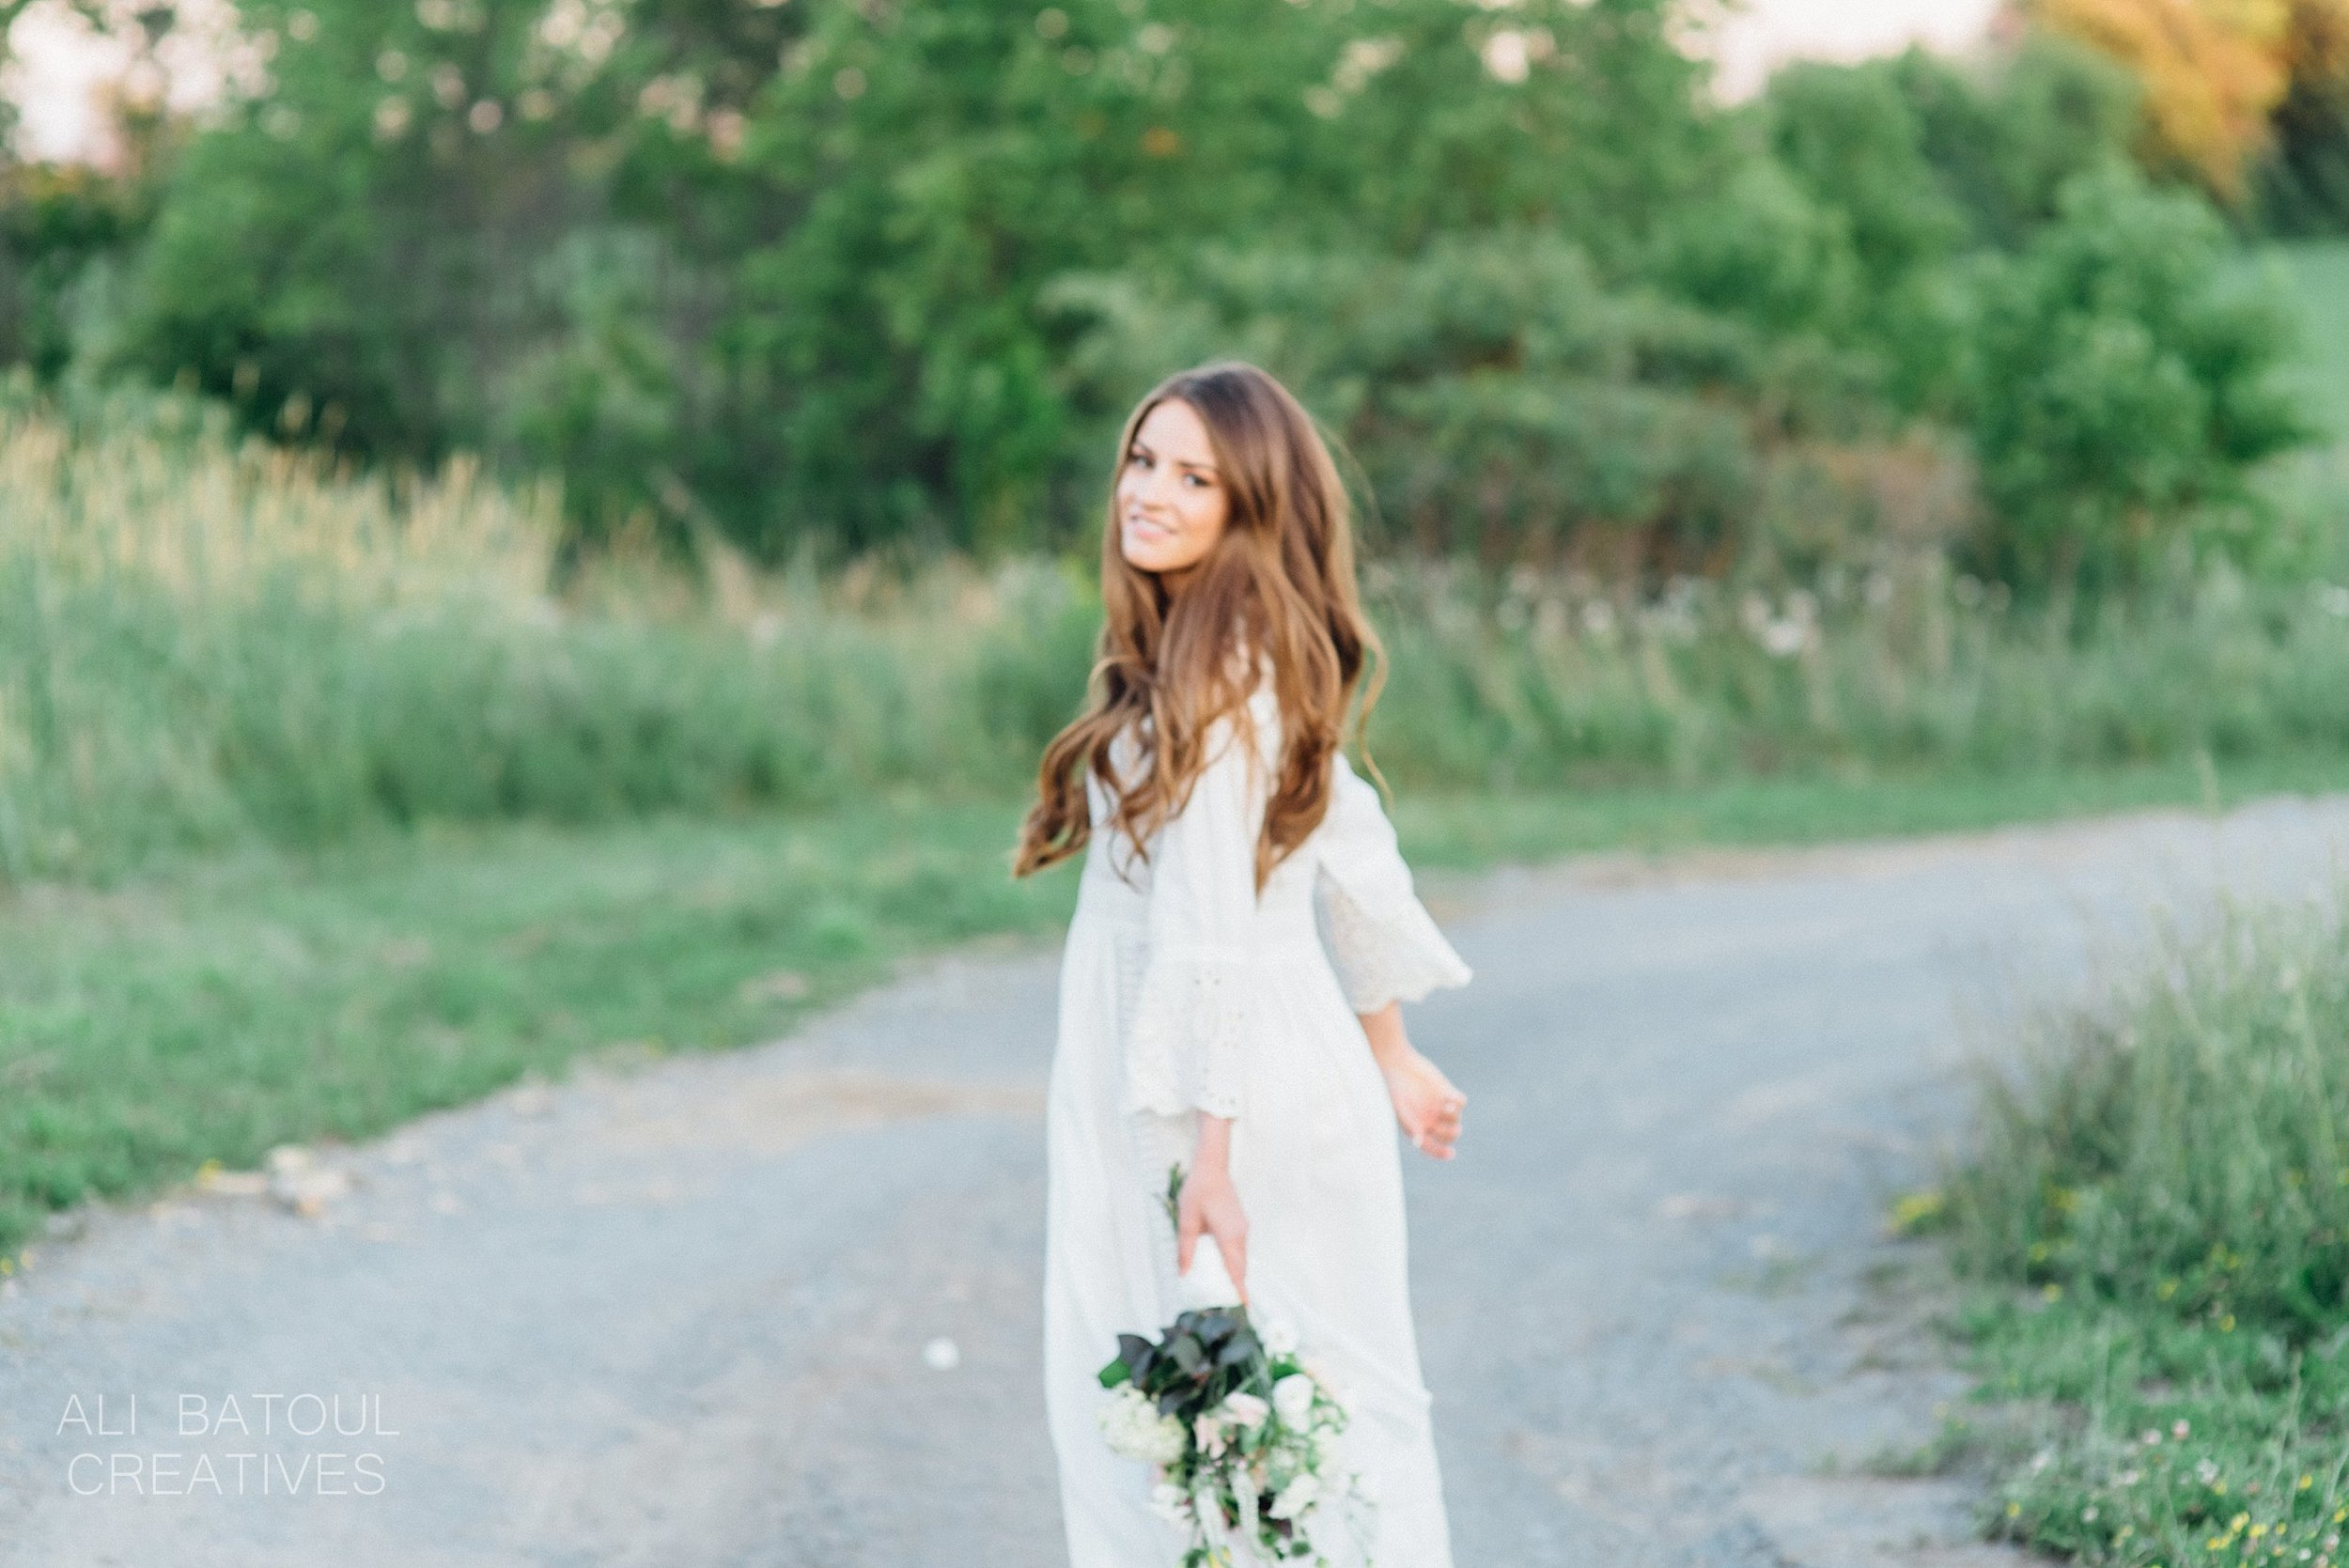 Boho Bridal Ottawa - Ali Batoul Creatives Fine Art Wedding Photography_0378.jpg